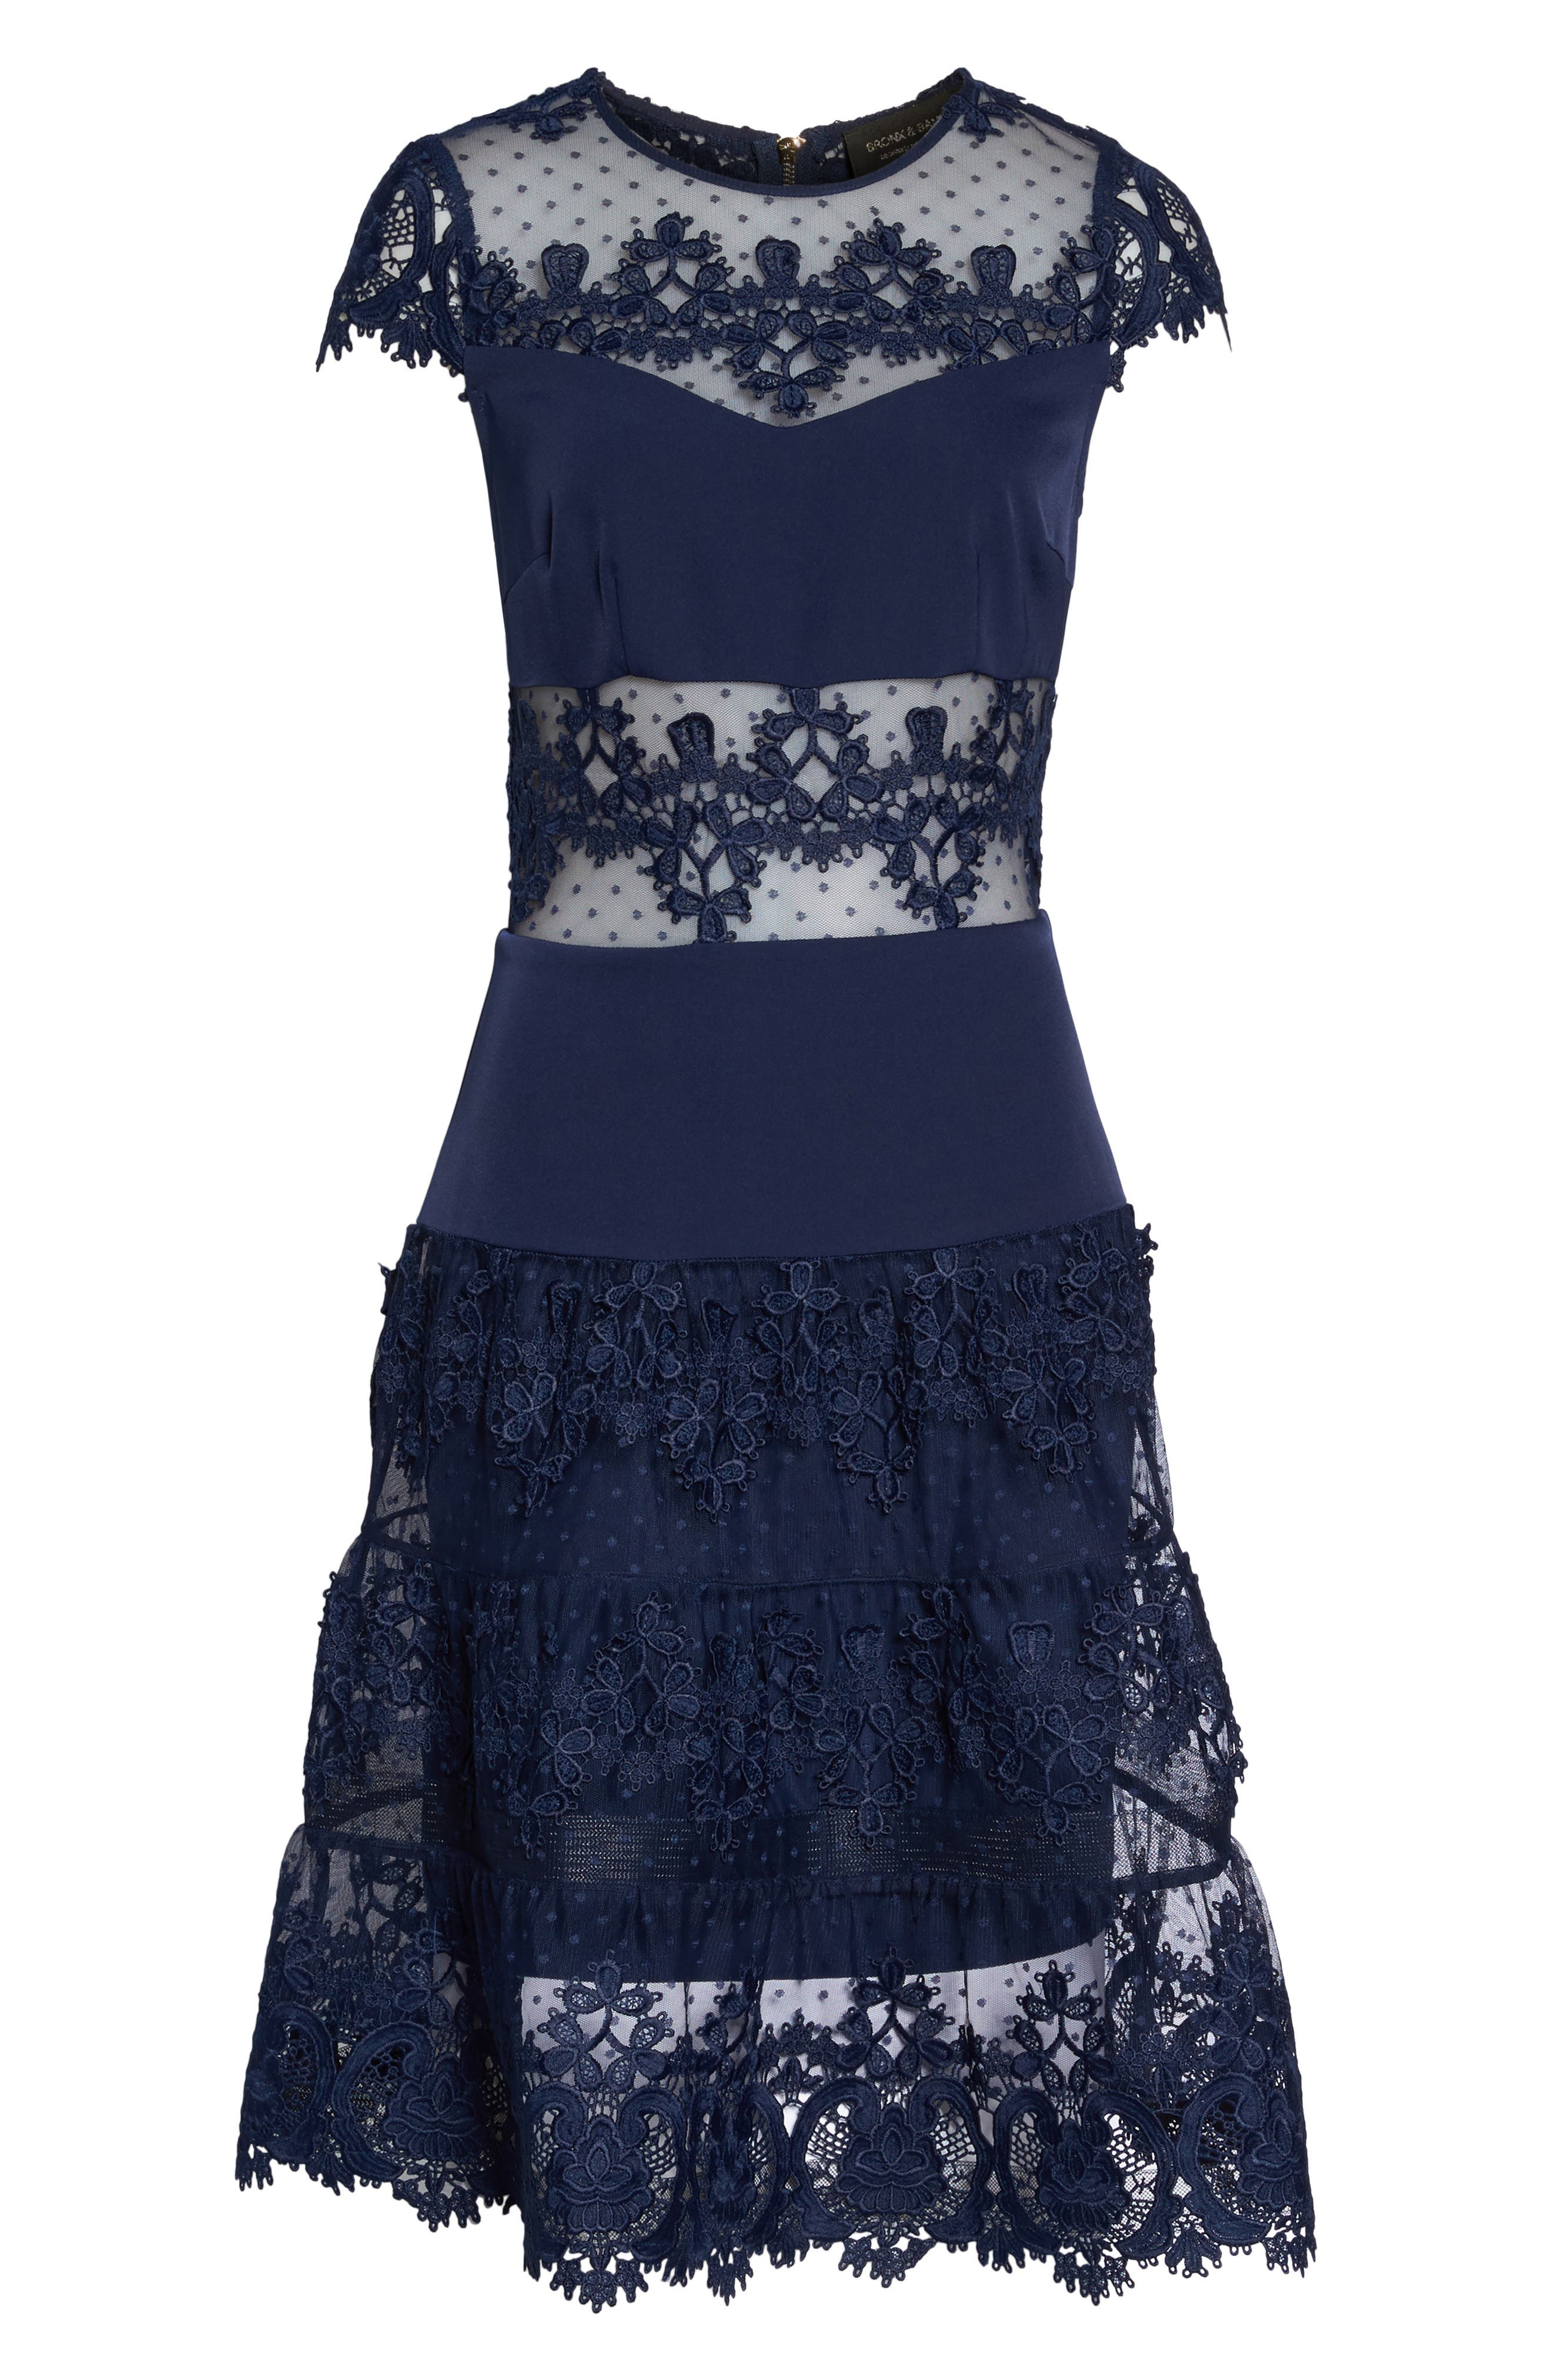 Flamenco Lace Inset Fit & Flare Dress,                             Alternate thumbnail 6, color,                             410